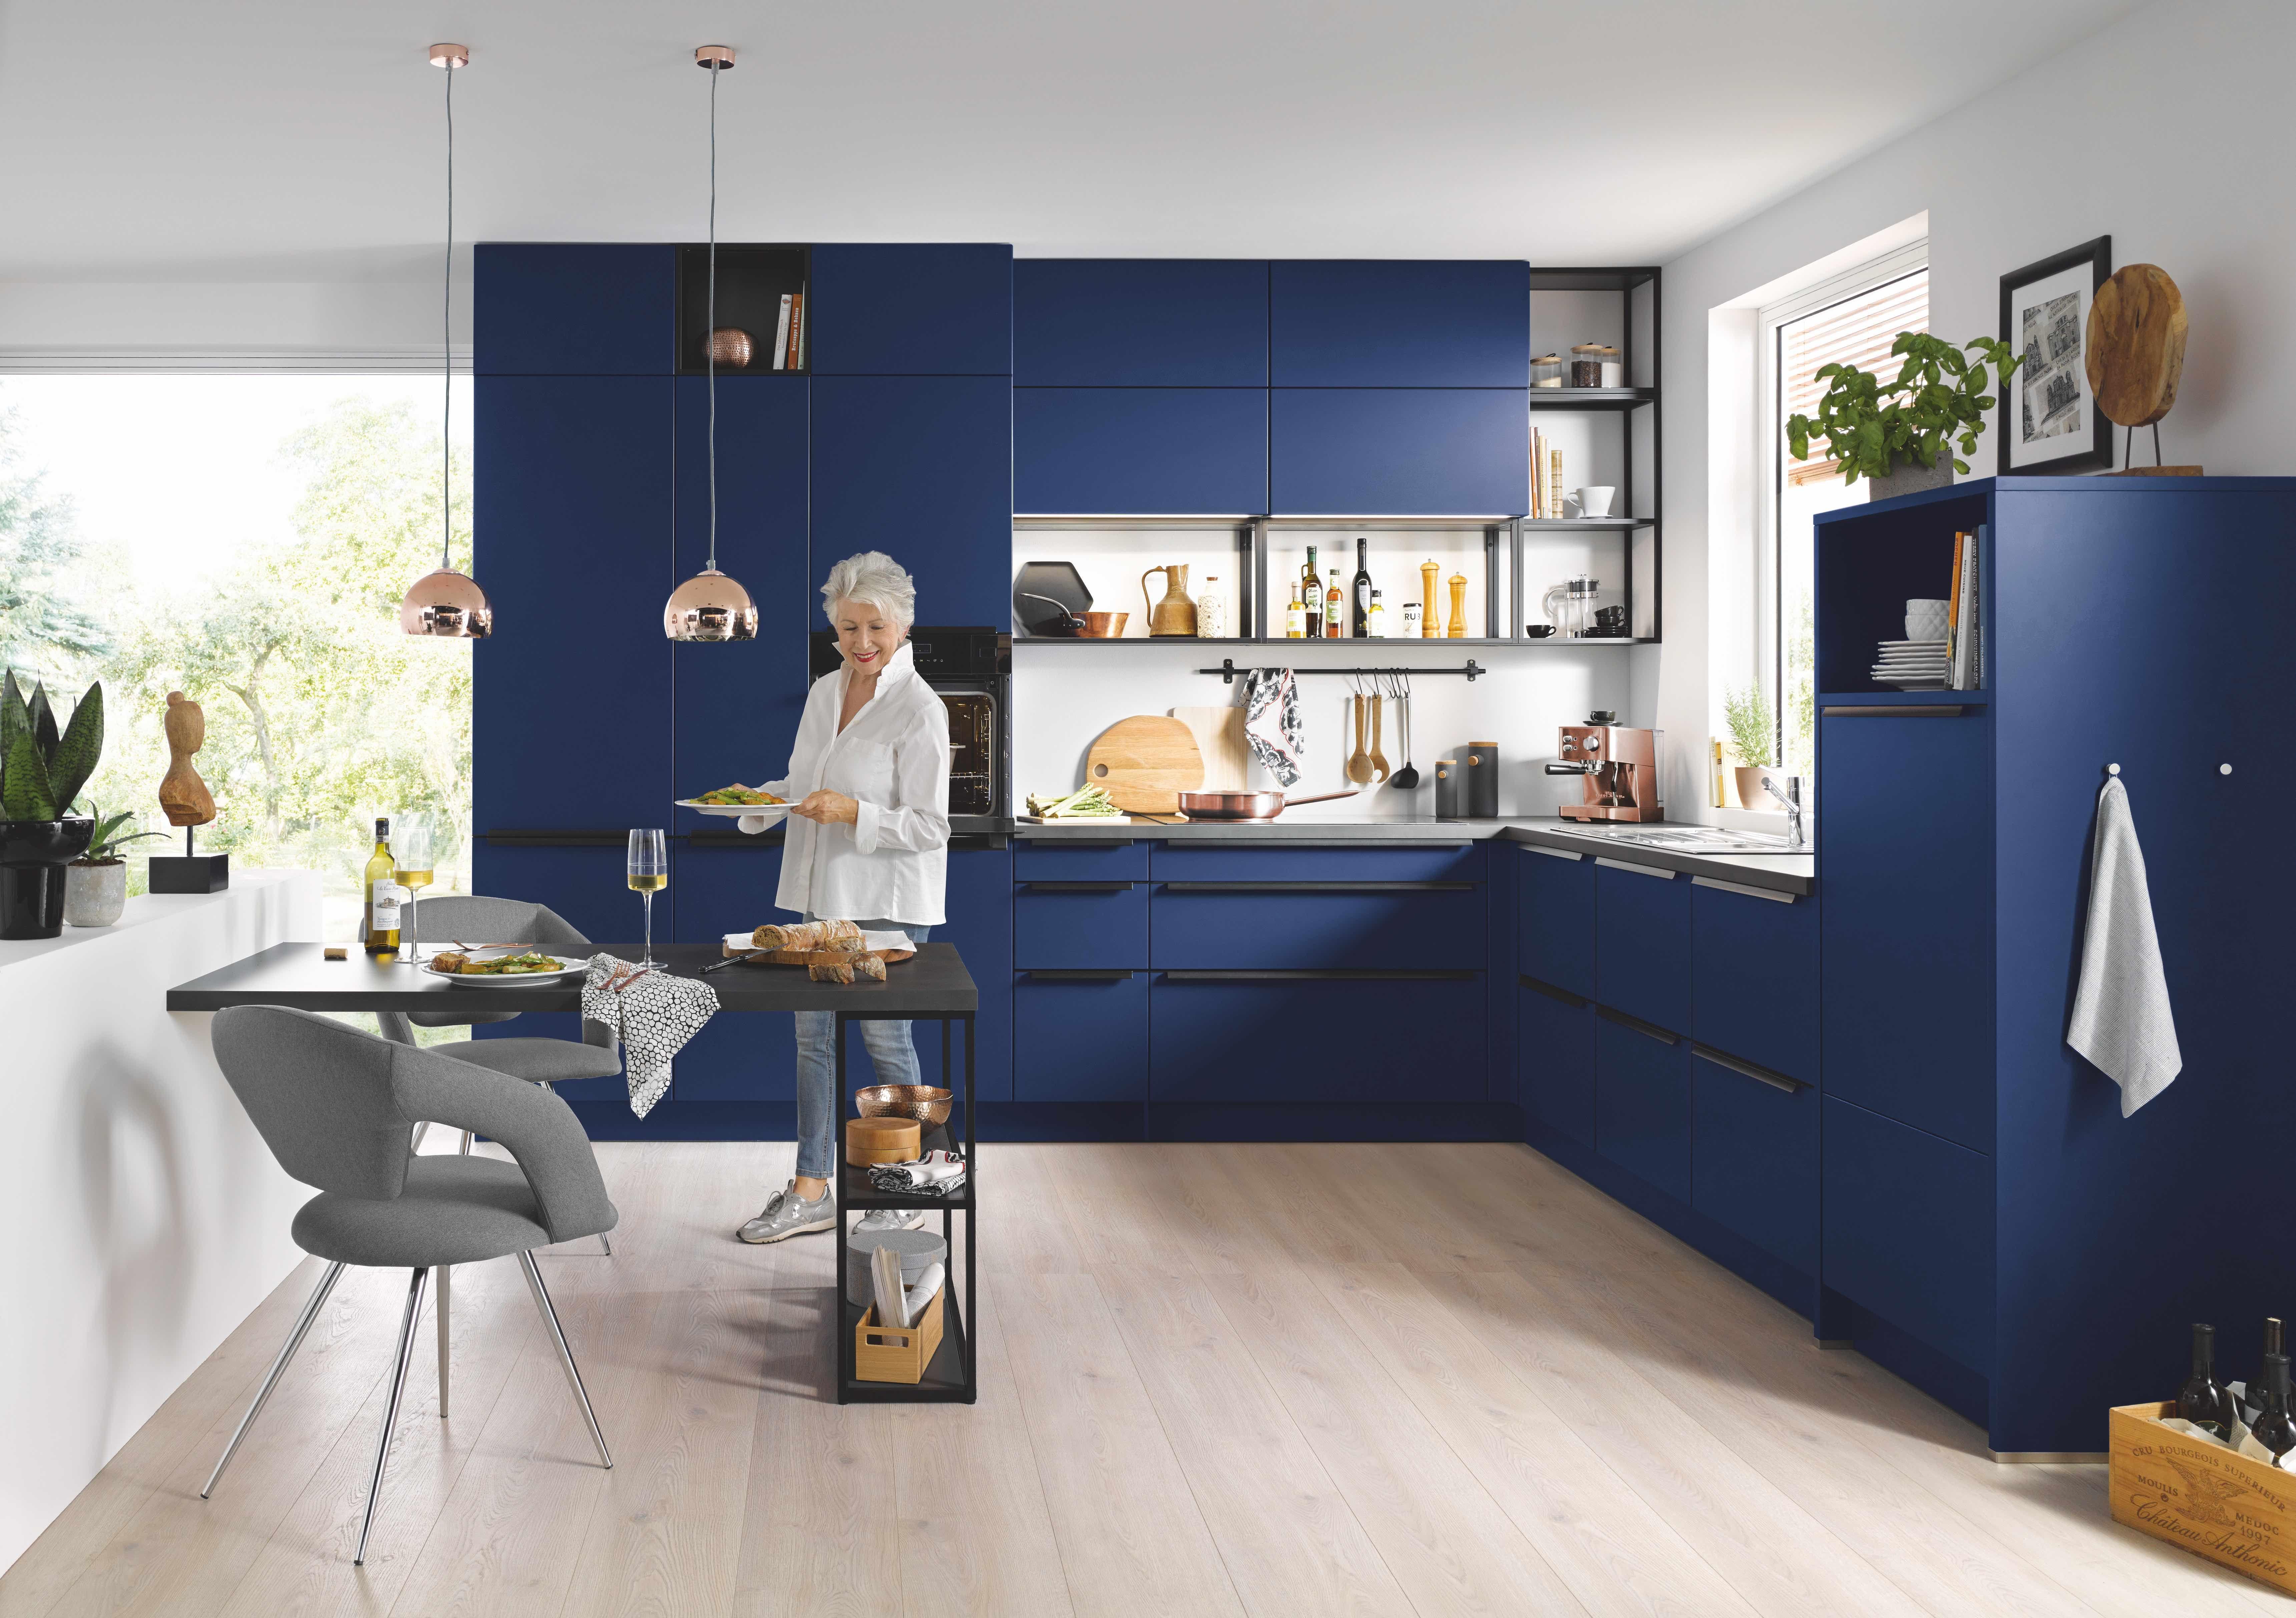 Schuller Kitchens Available At Aqueous Princes Risborough Kitchen Interior Artisan Interiors German Kitchen